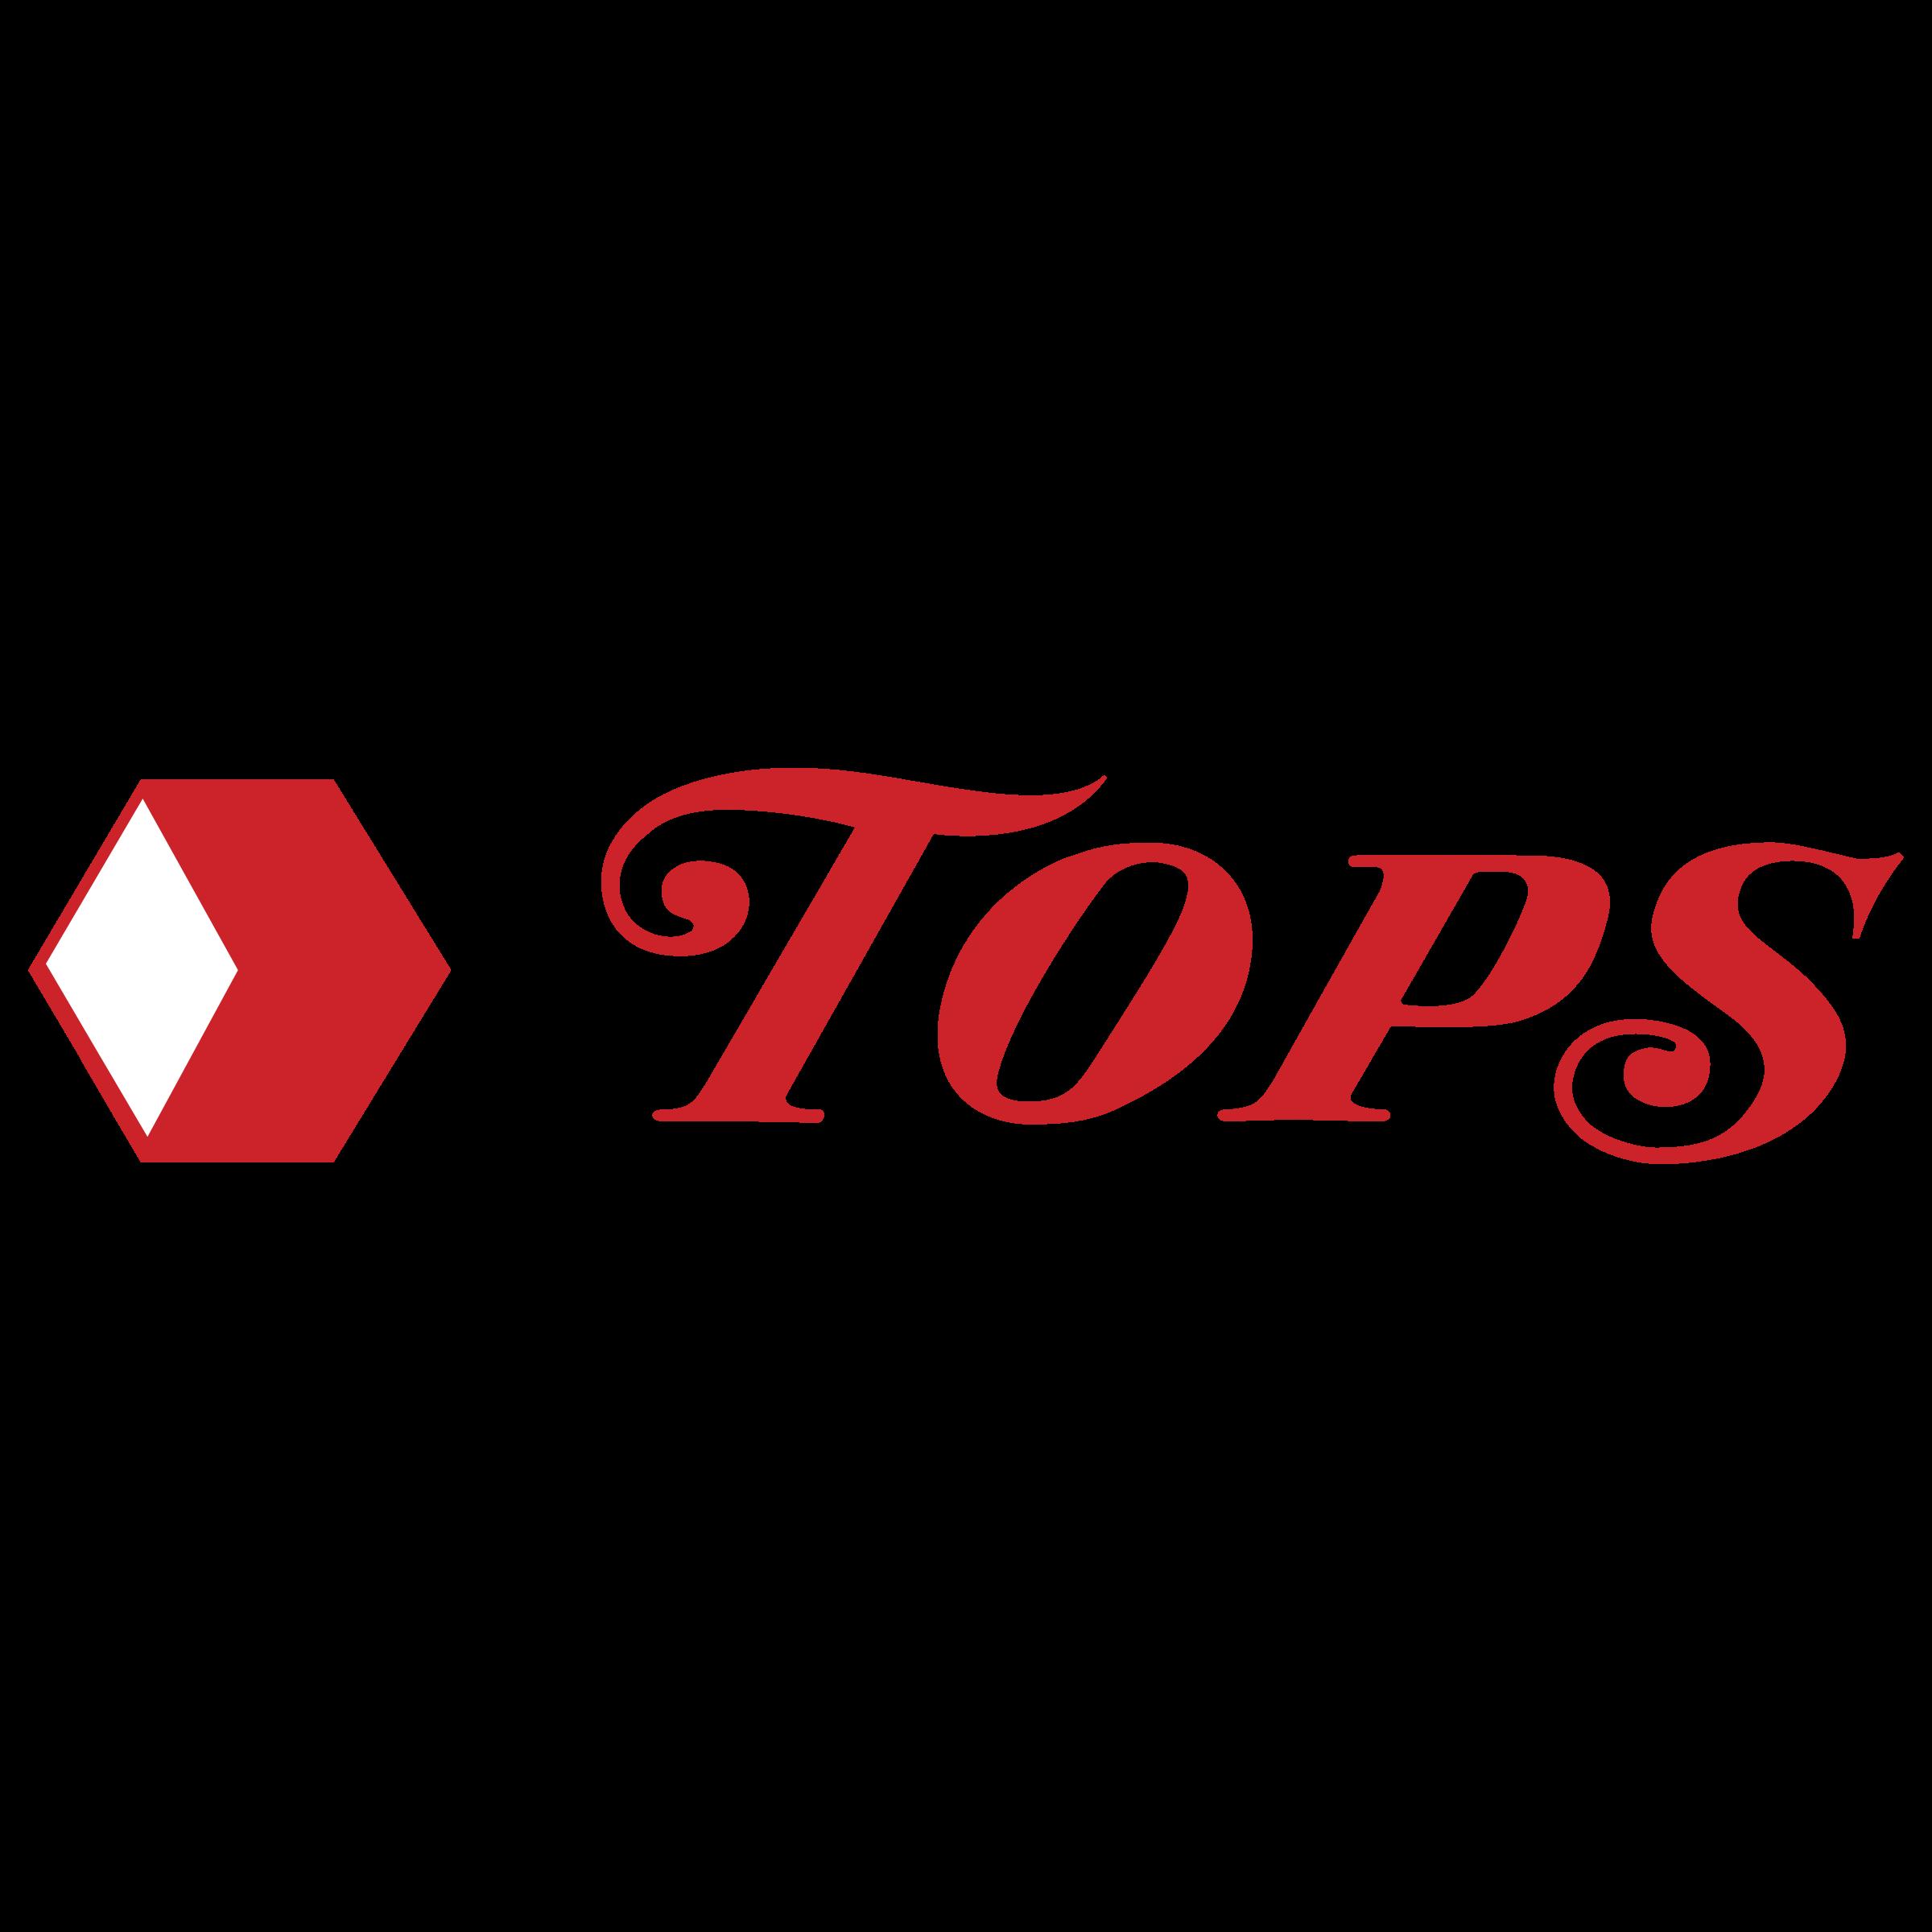 tops logo png transparent amp svg vector freebie supply